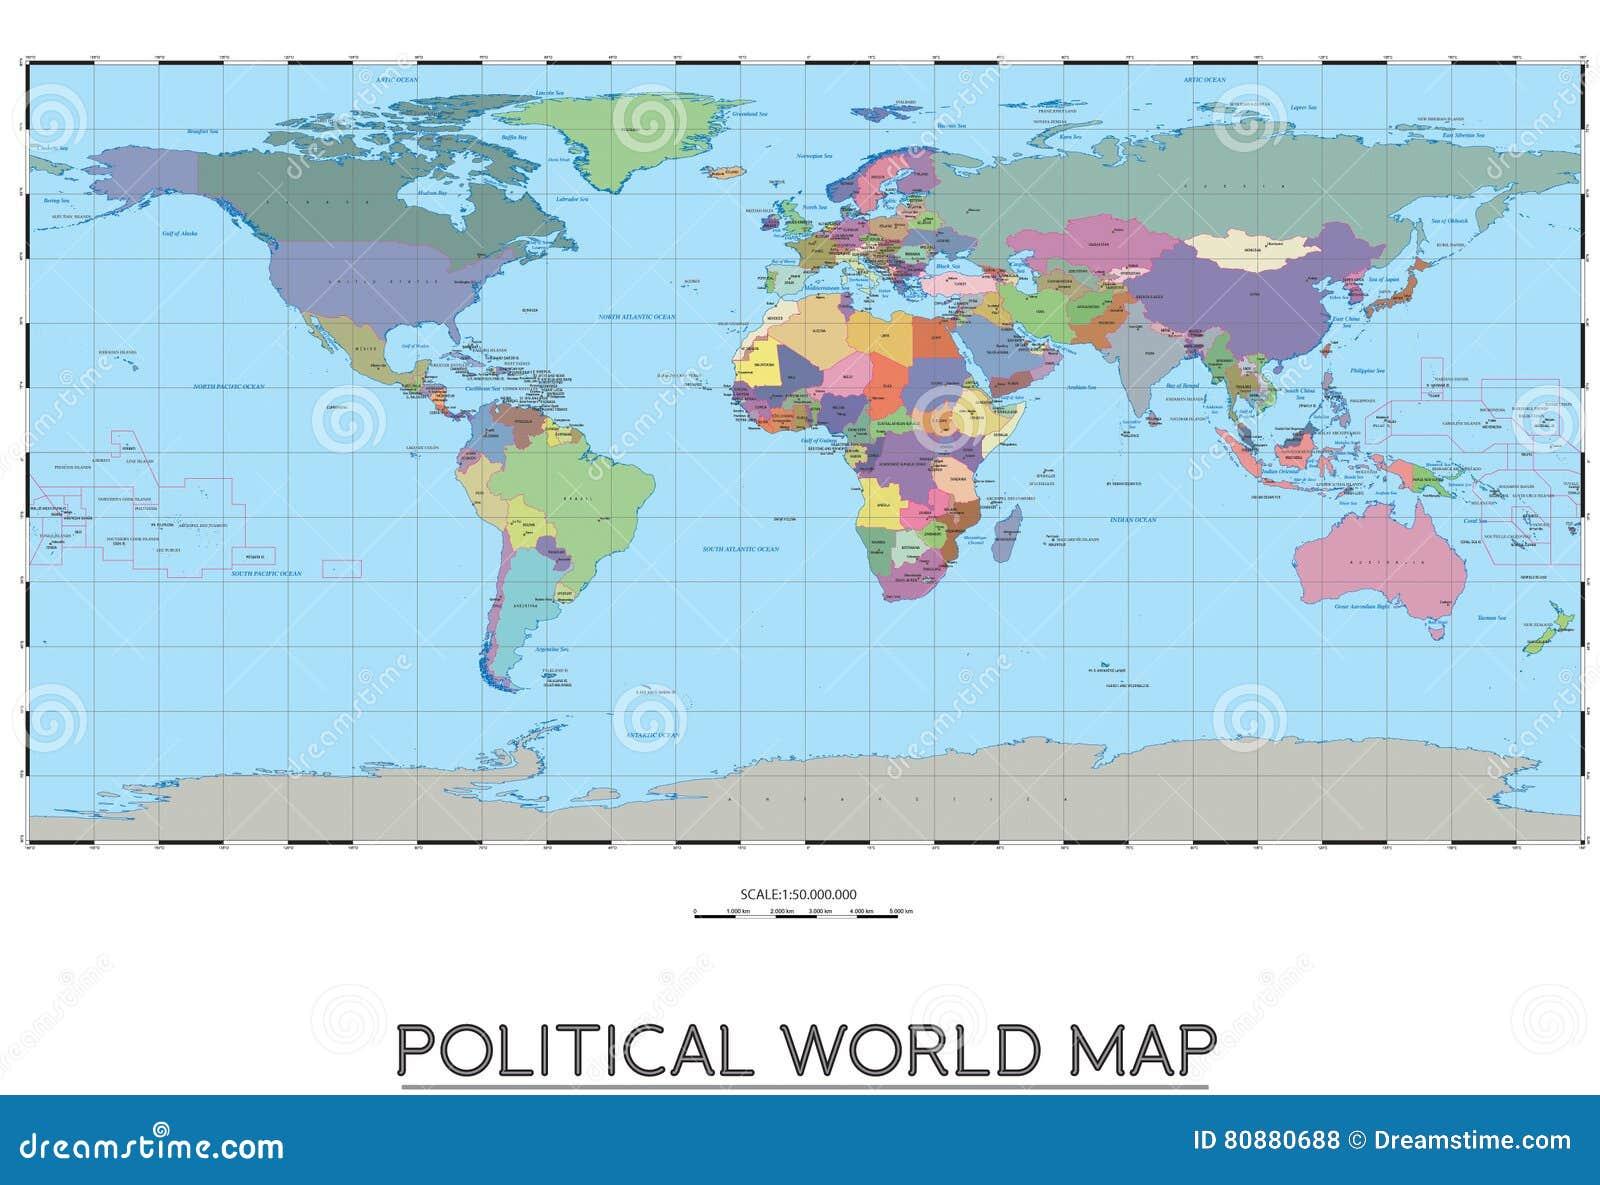 Political world map stock vector illustration of america 80880688 download political world map stock vector illustration of america 80880688 gumiabroncs Images